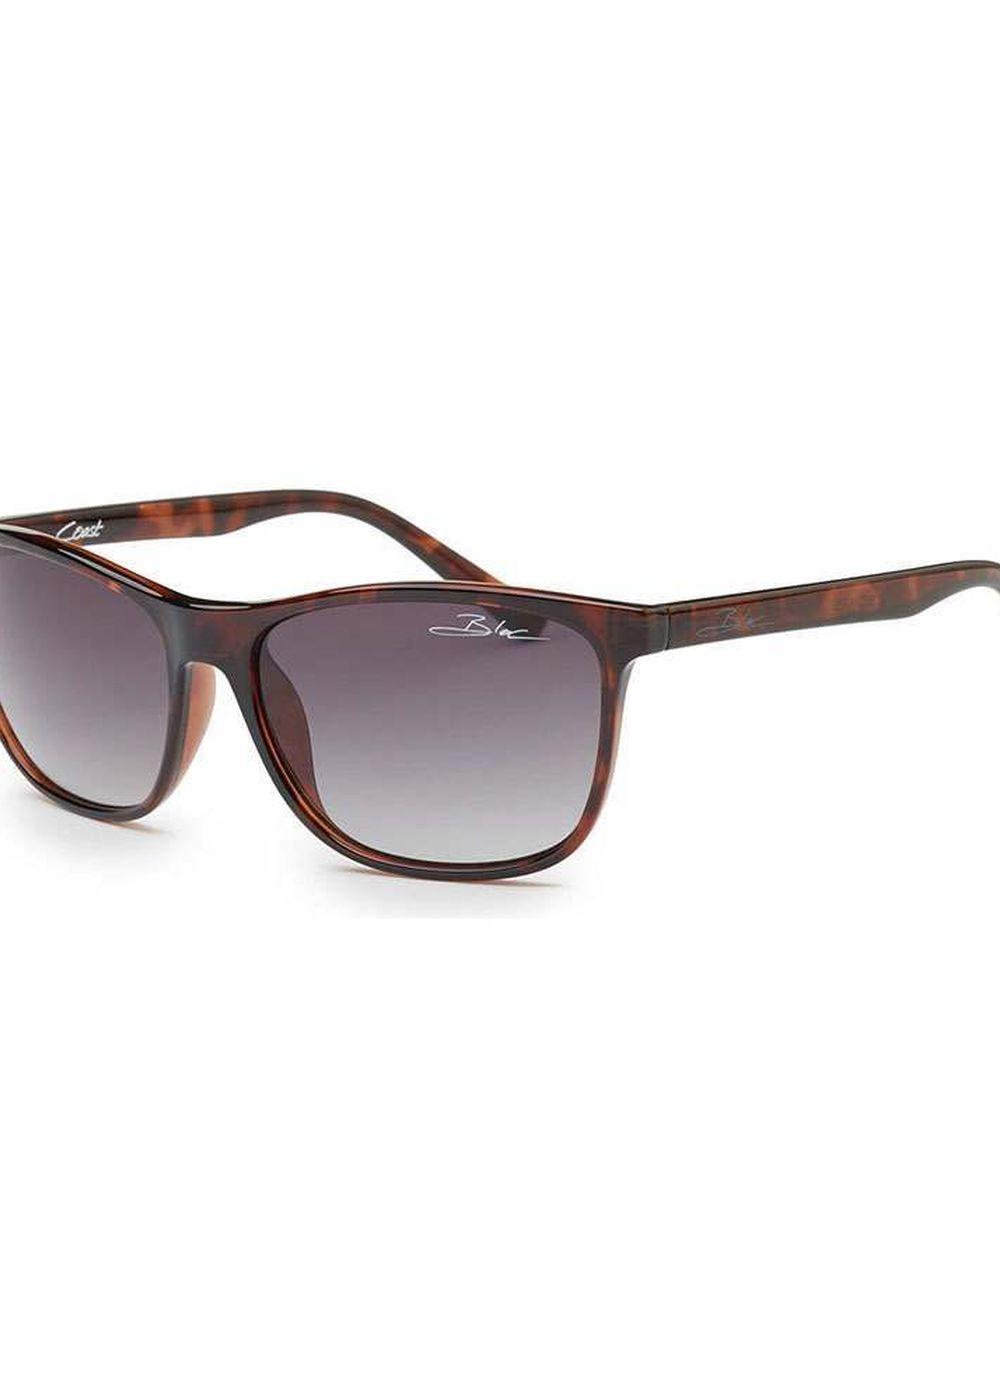 bloc-coast-sunglasses-shiny-tortpolarised-grey